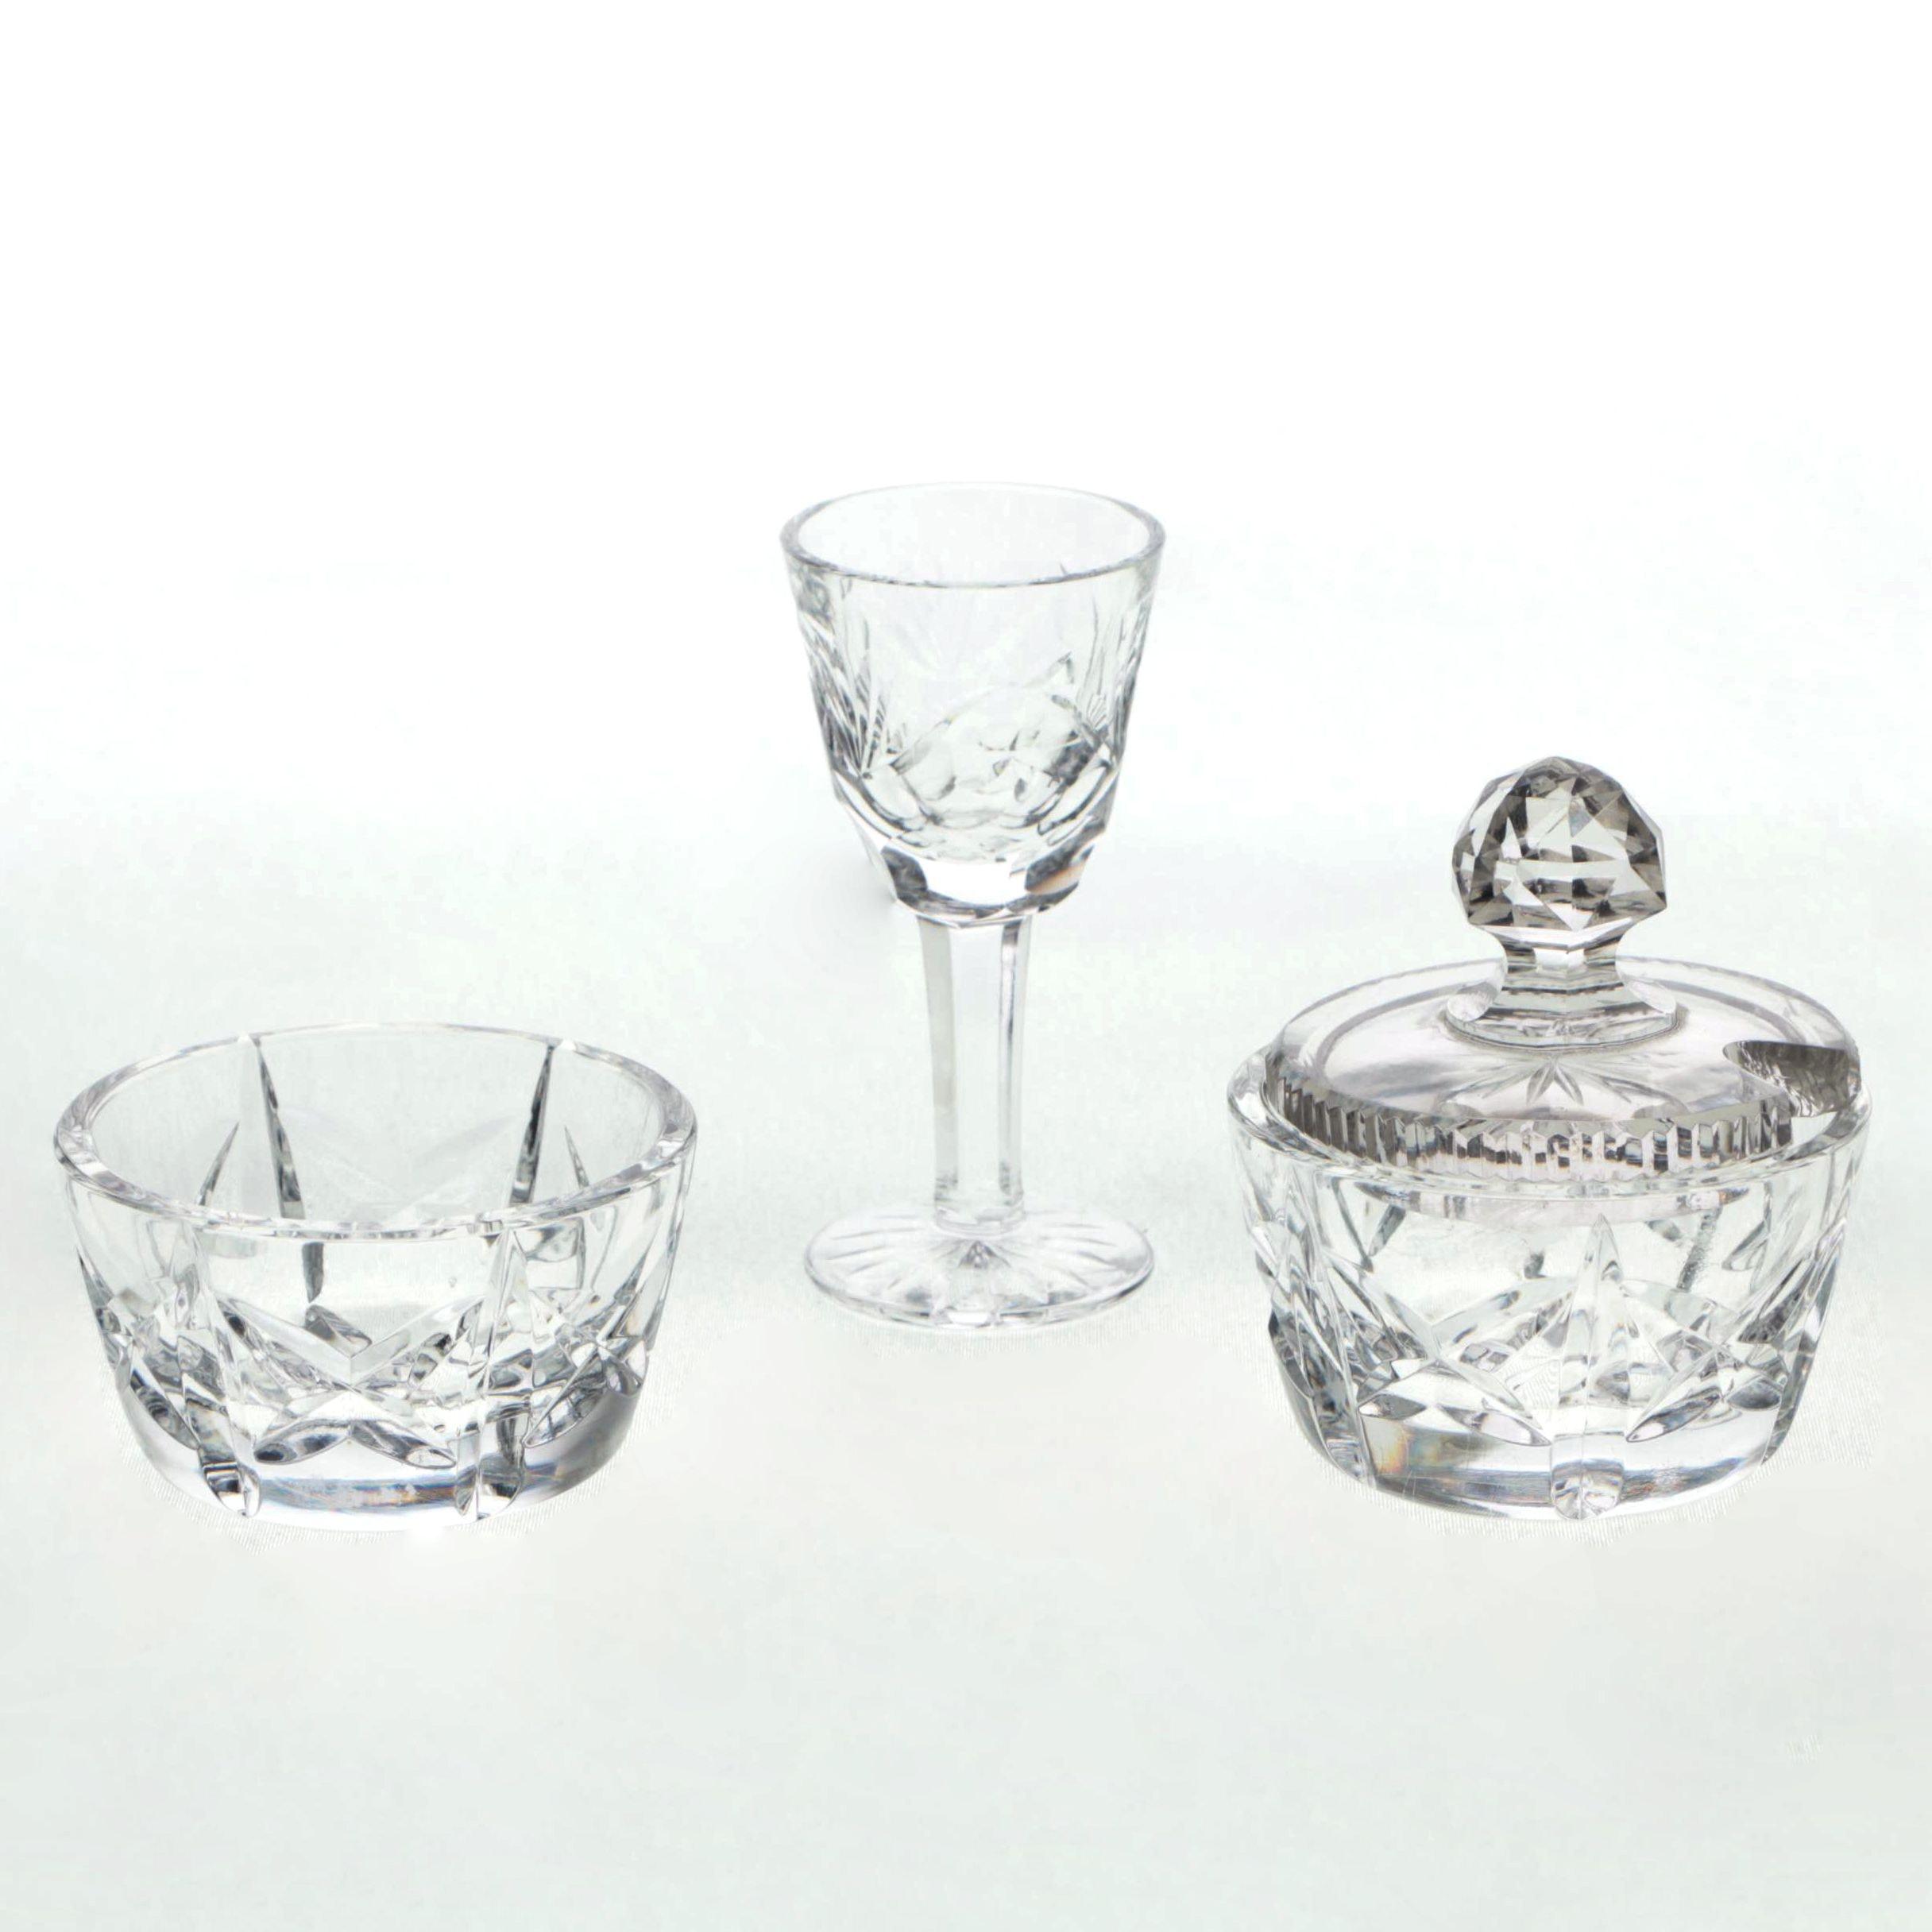 Waterford Crystal Glassware